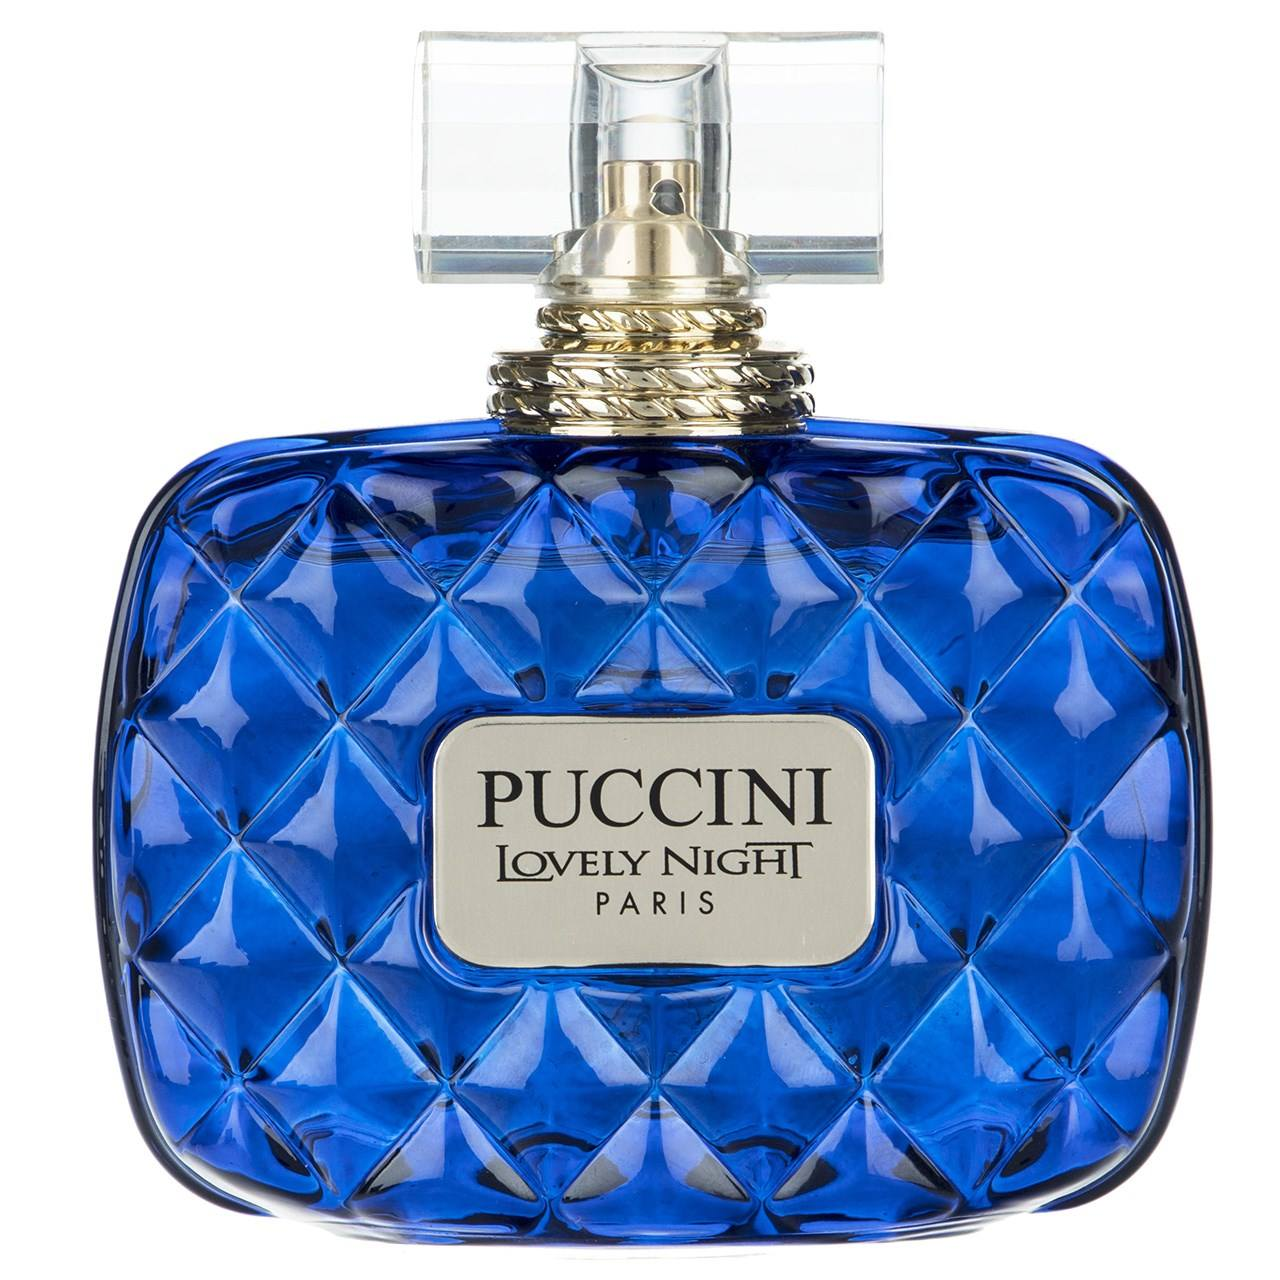 ادو پرفیوم زنانه پوچینی مدل Lovely Night Blue حجم 100 میلی لیتر -  - 1